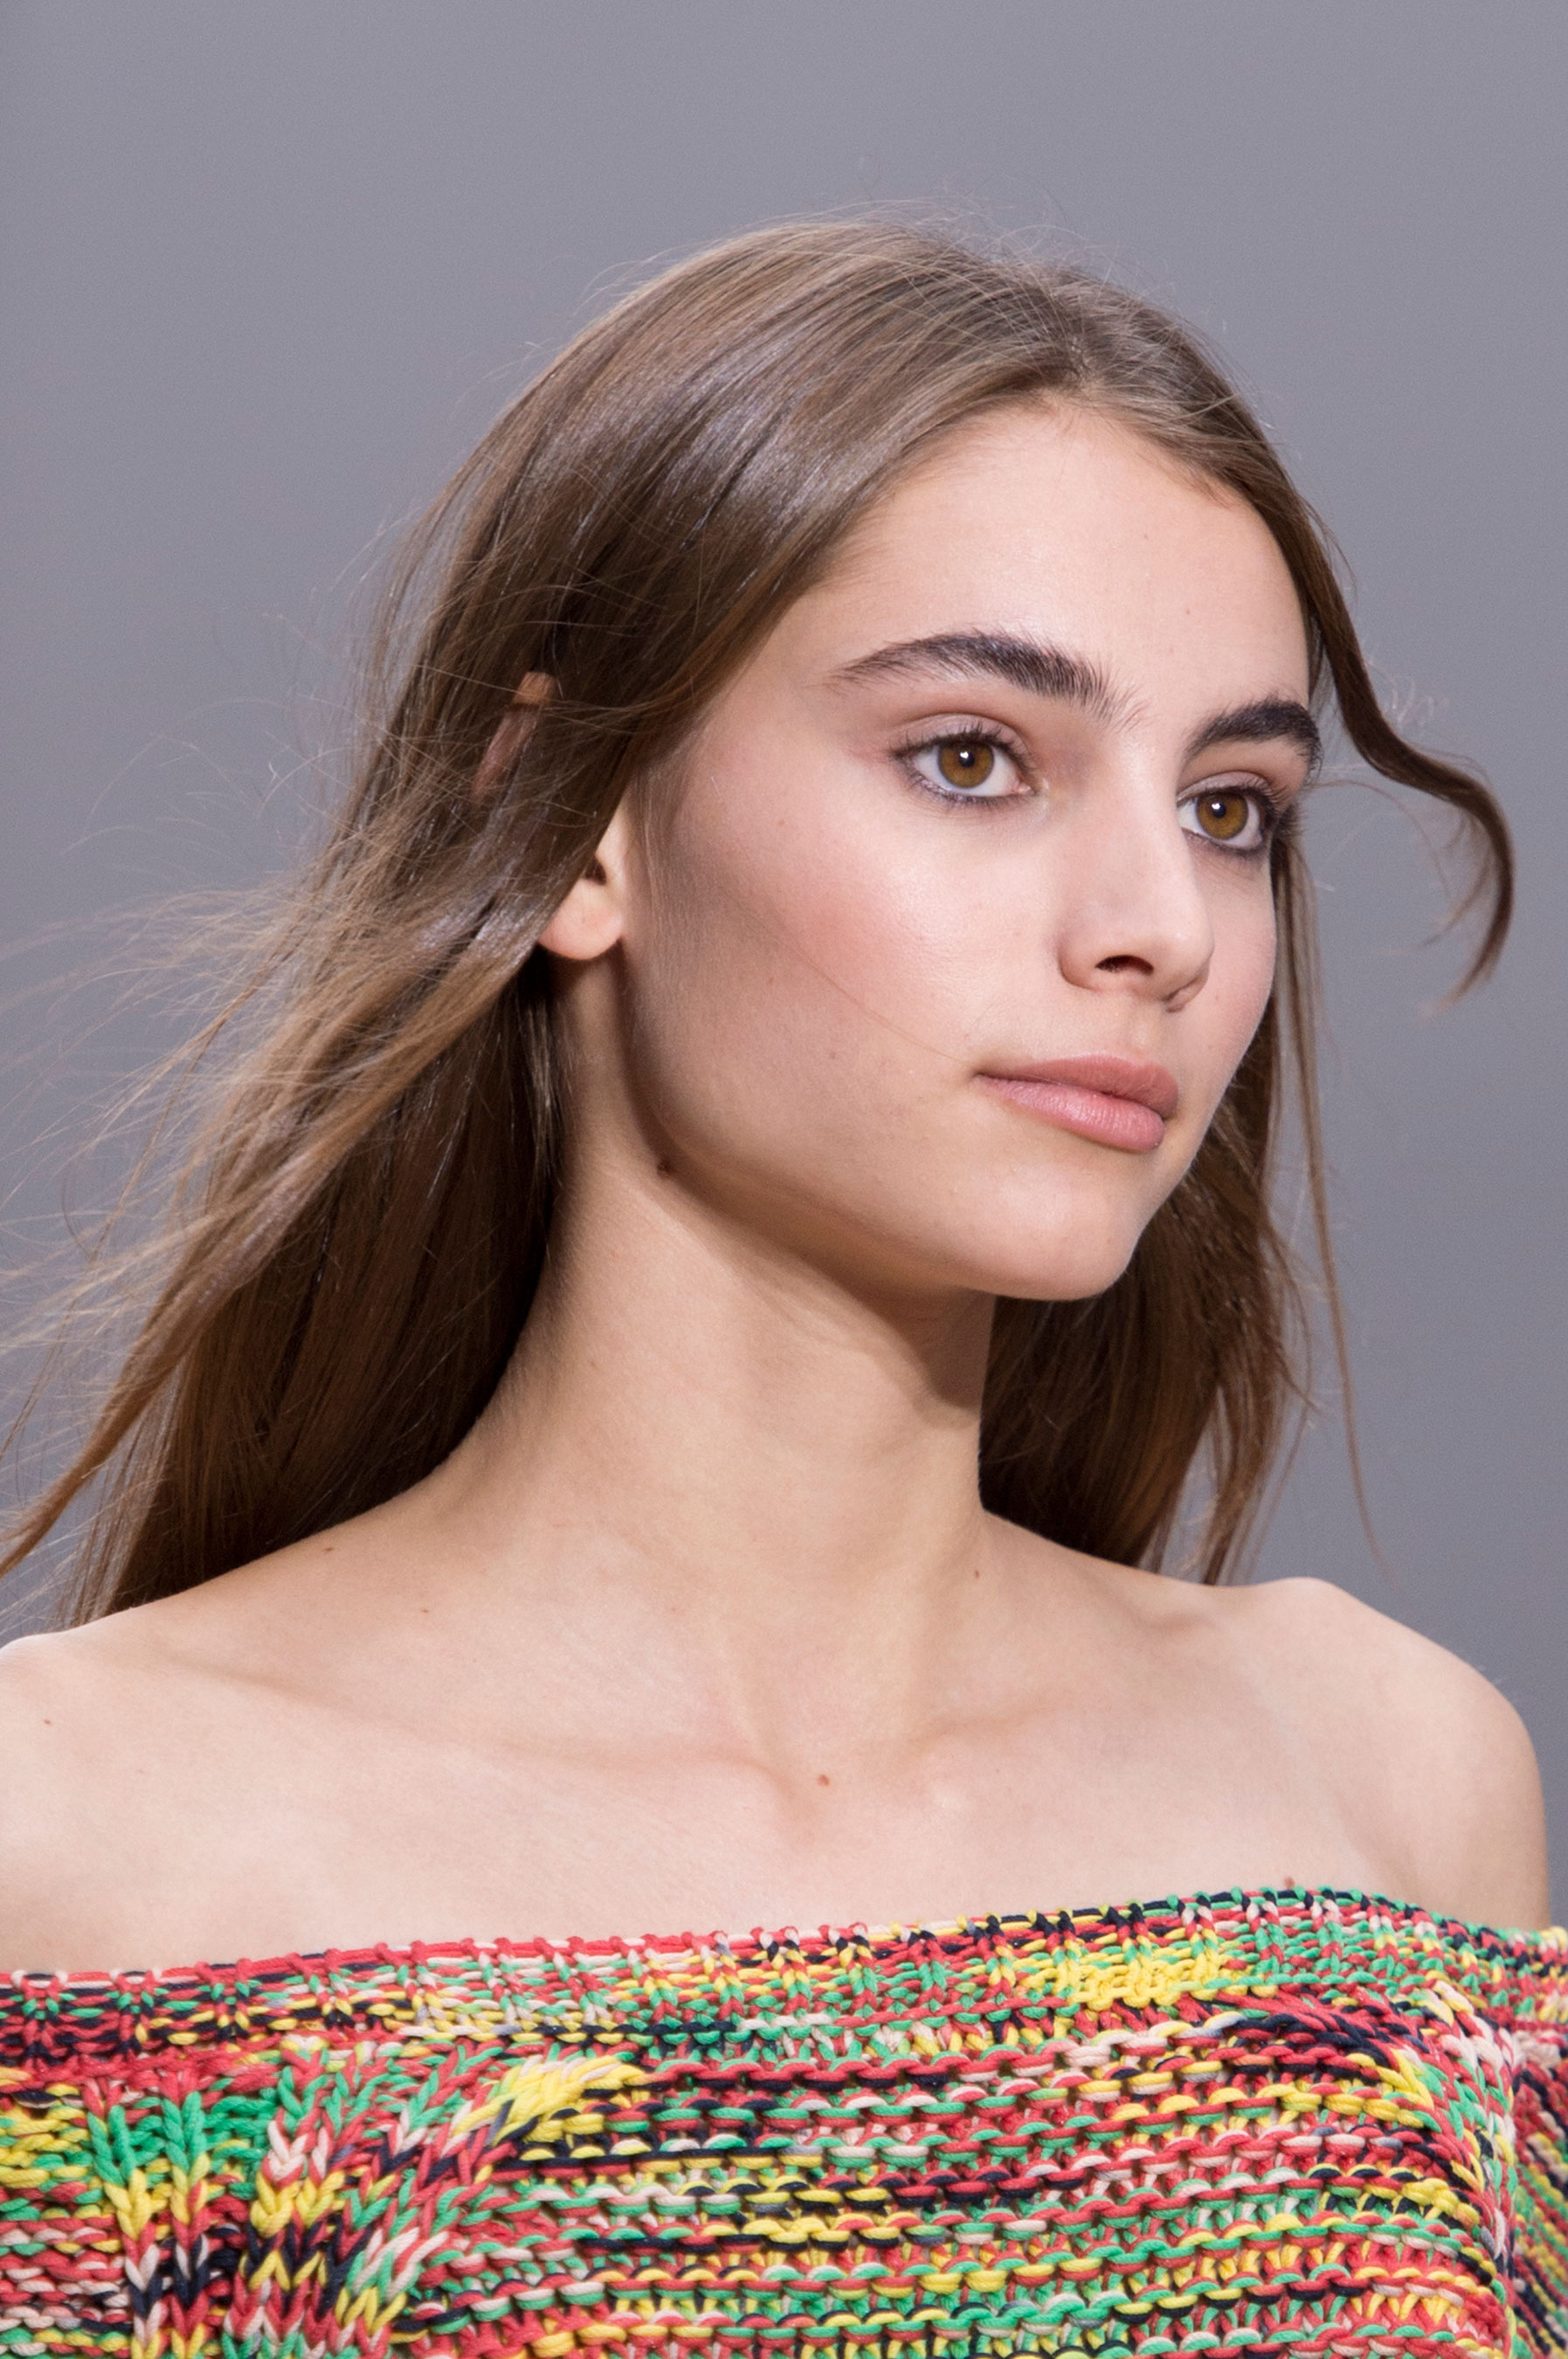 Chloe-spring-2016-runway-beauty-fashion-show-the-impression-15